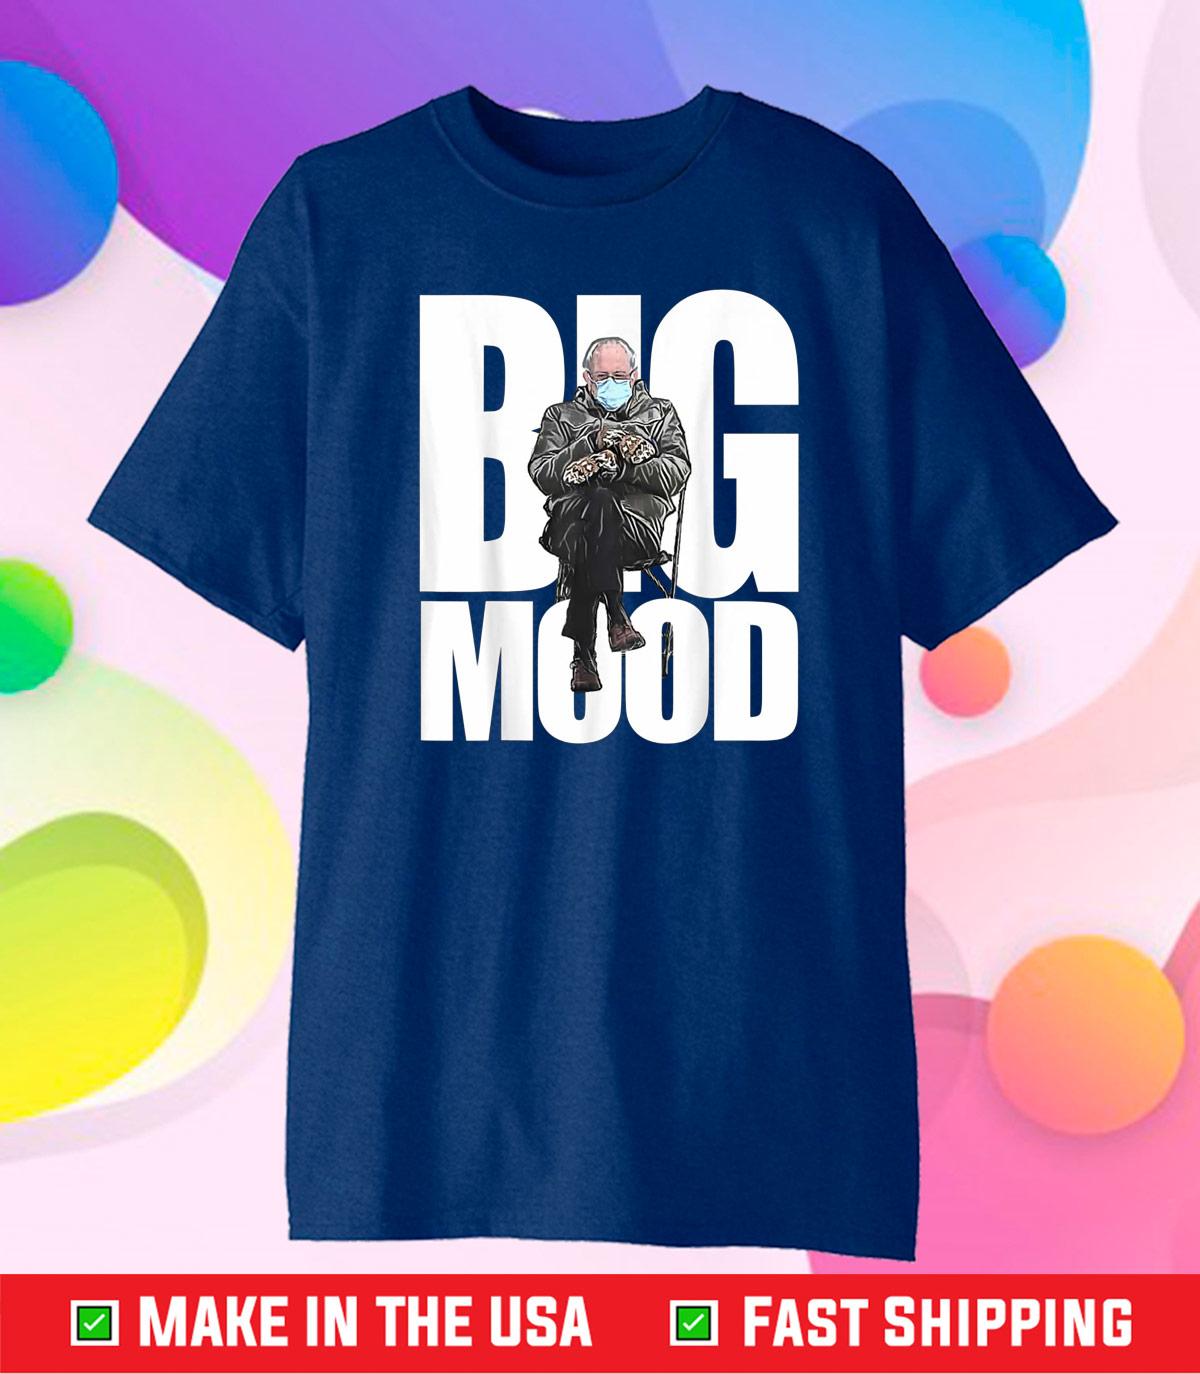 Biden Inauguration Bernie's Mittens Bernie Sanders Gift T-Shirt